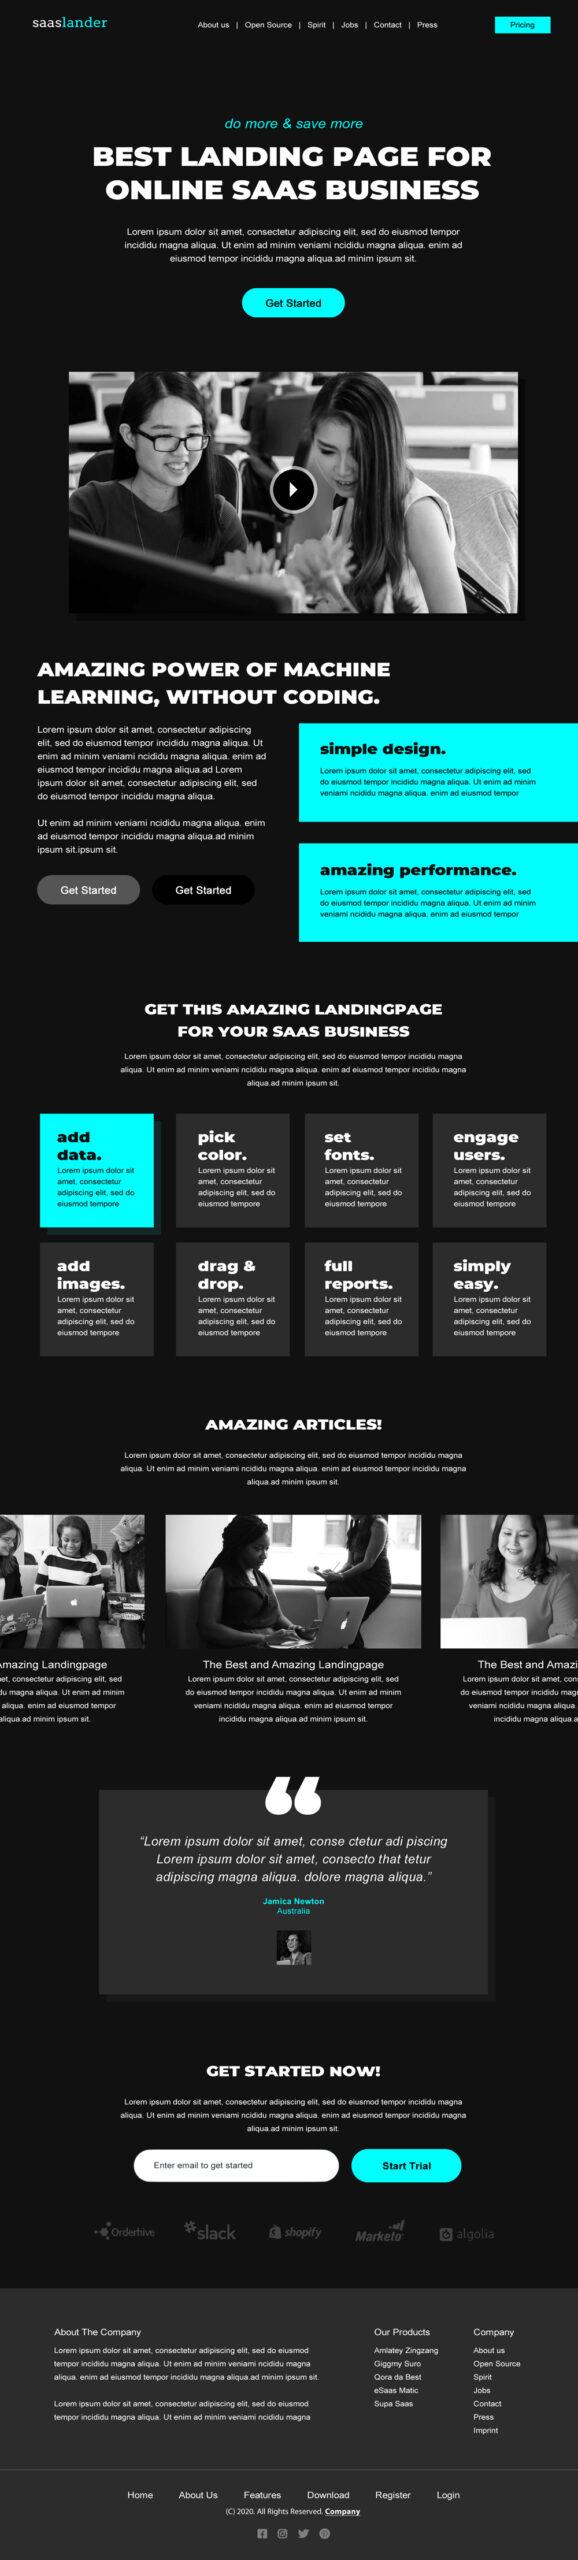 Creative Saas Lading Page